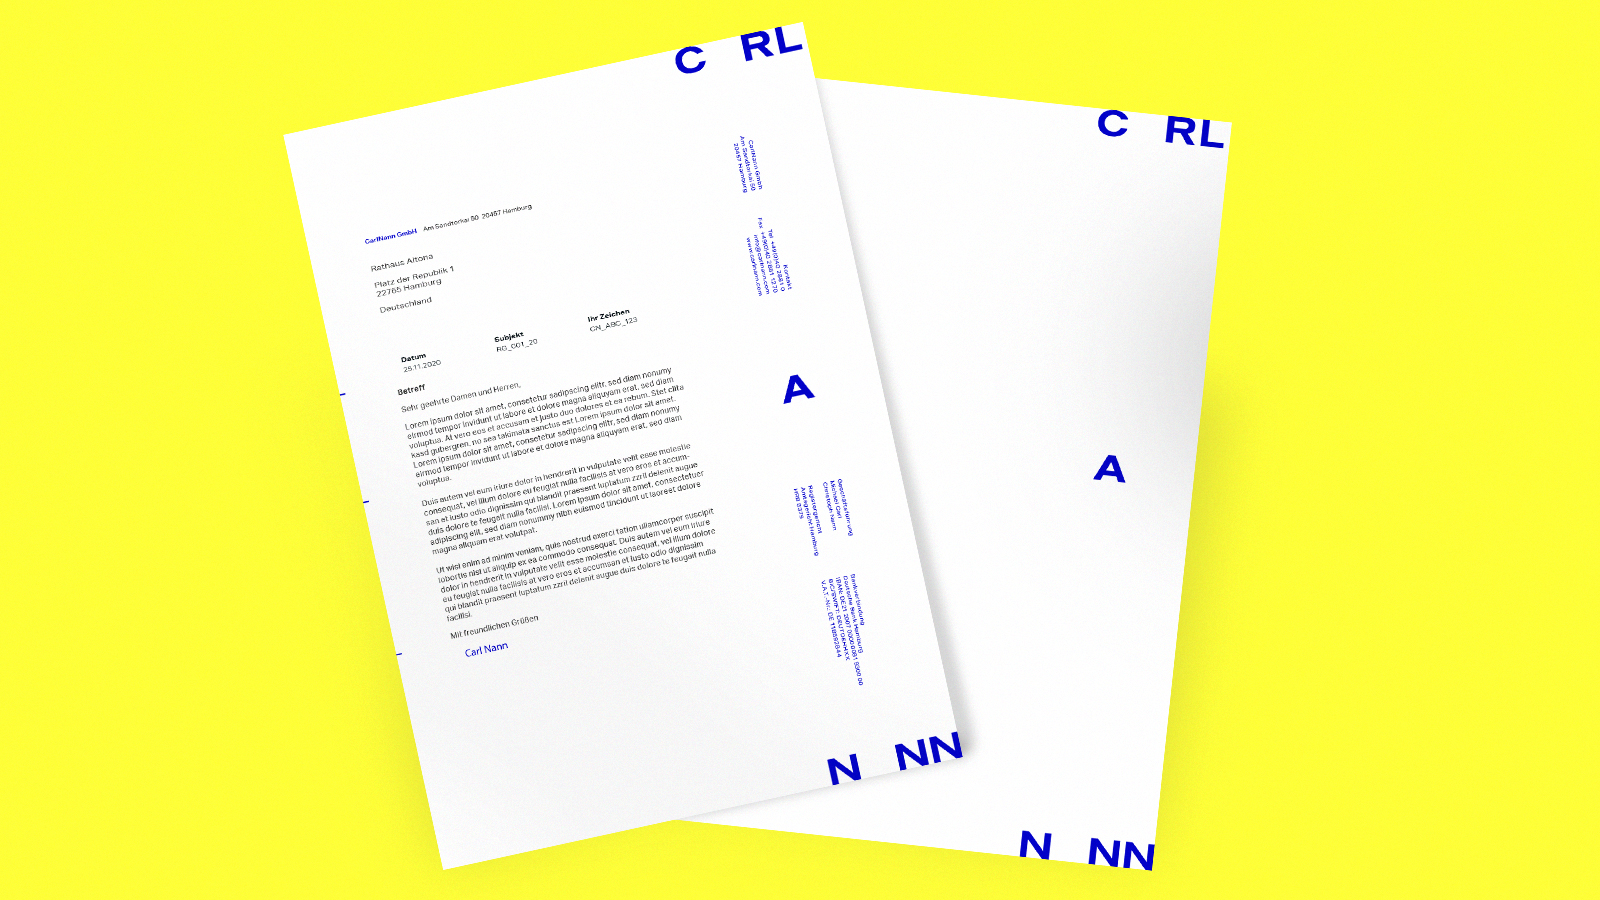 CarlNann Logo on documents on yellow background